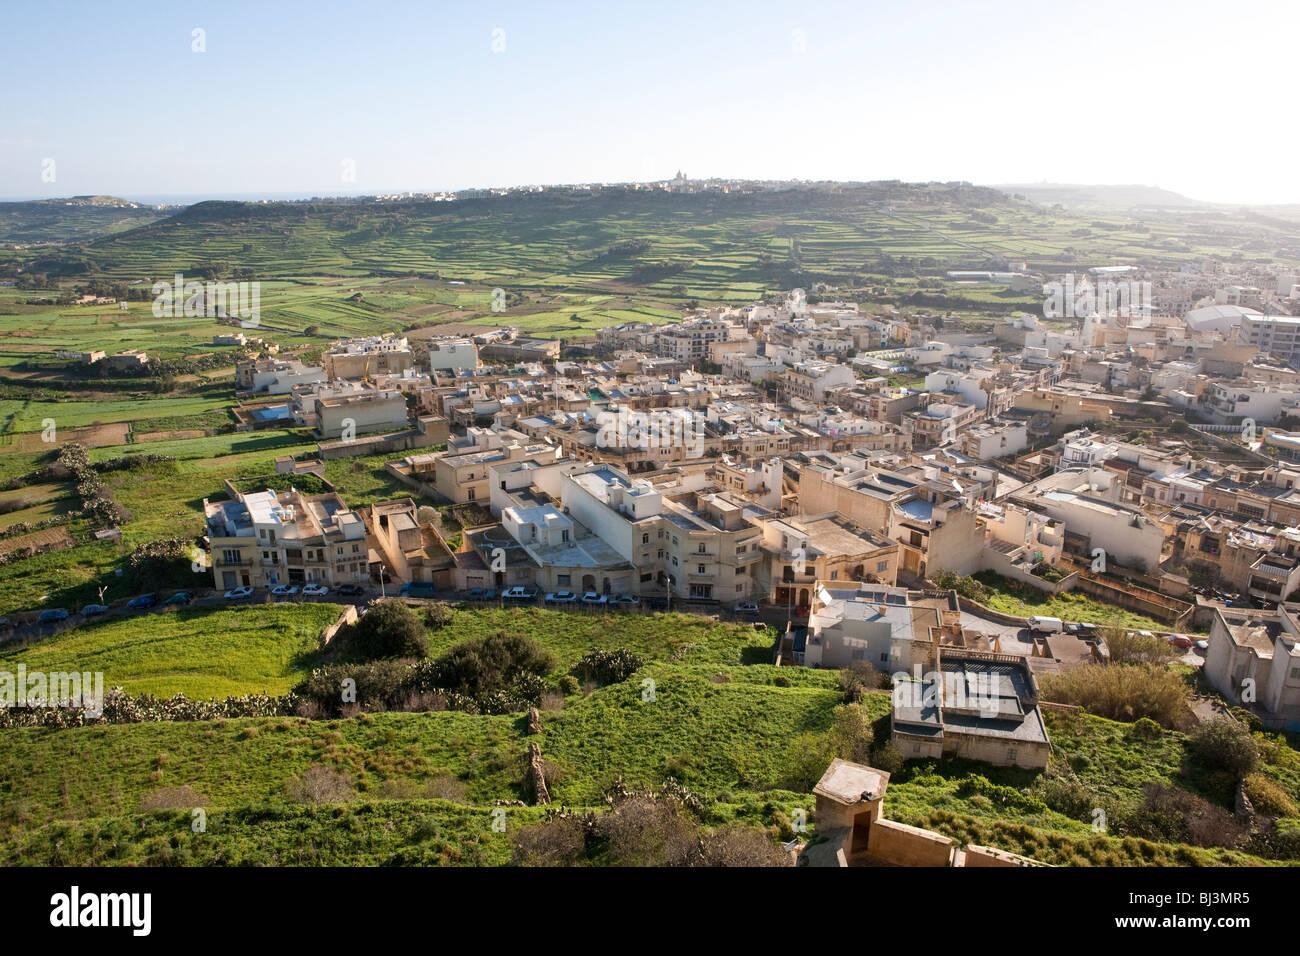 View from the Citadella or Citadel on Victoria, Rabat, Gozo, Malta, Europe Stock Photo